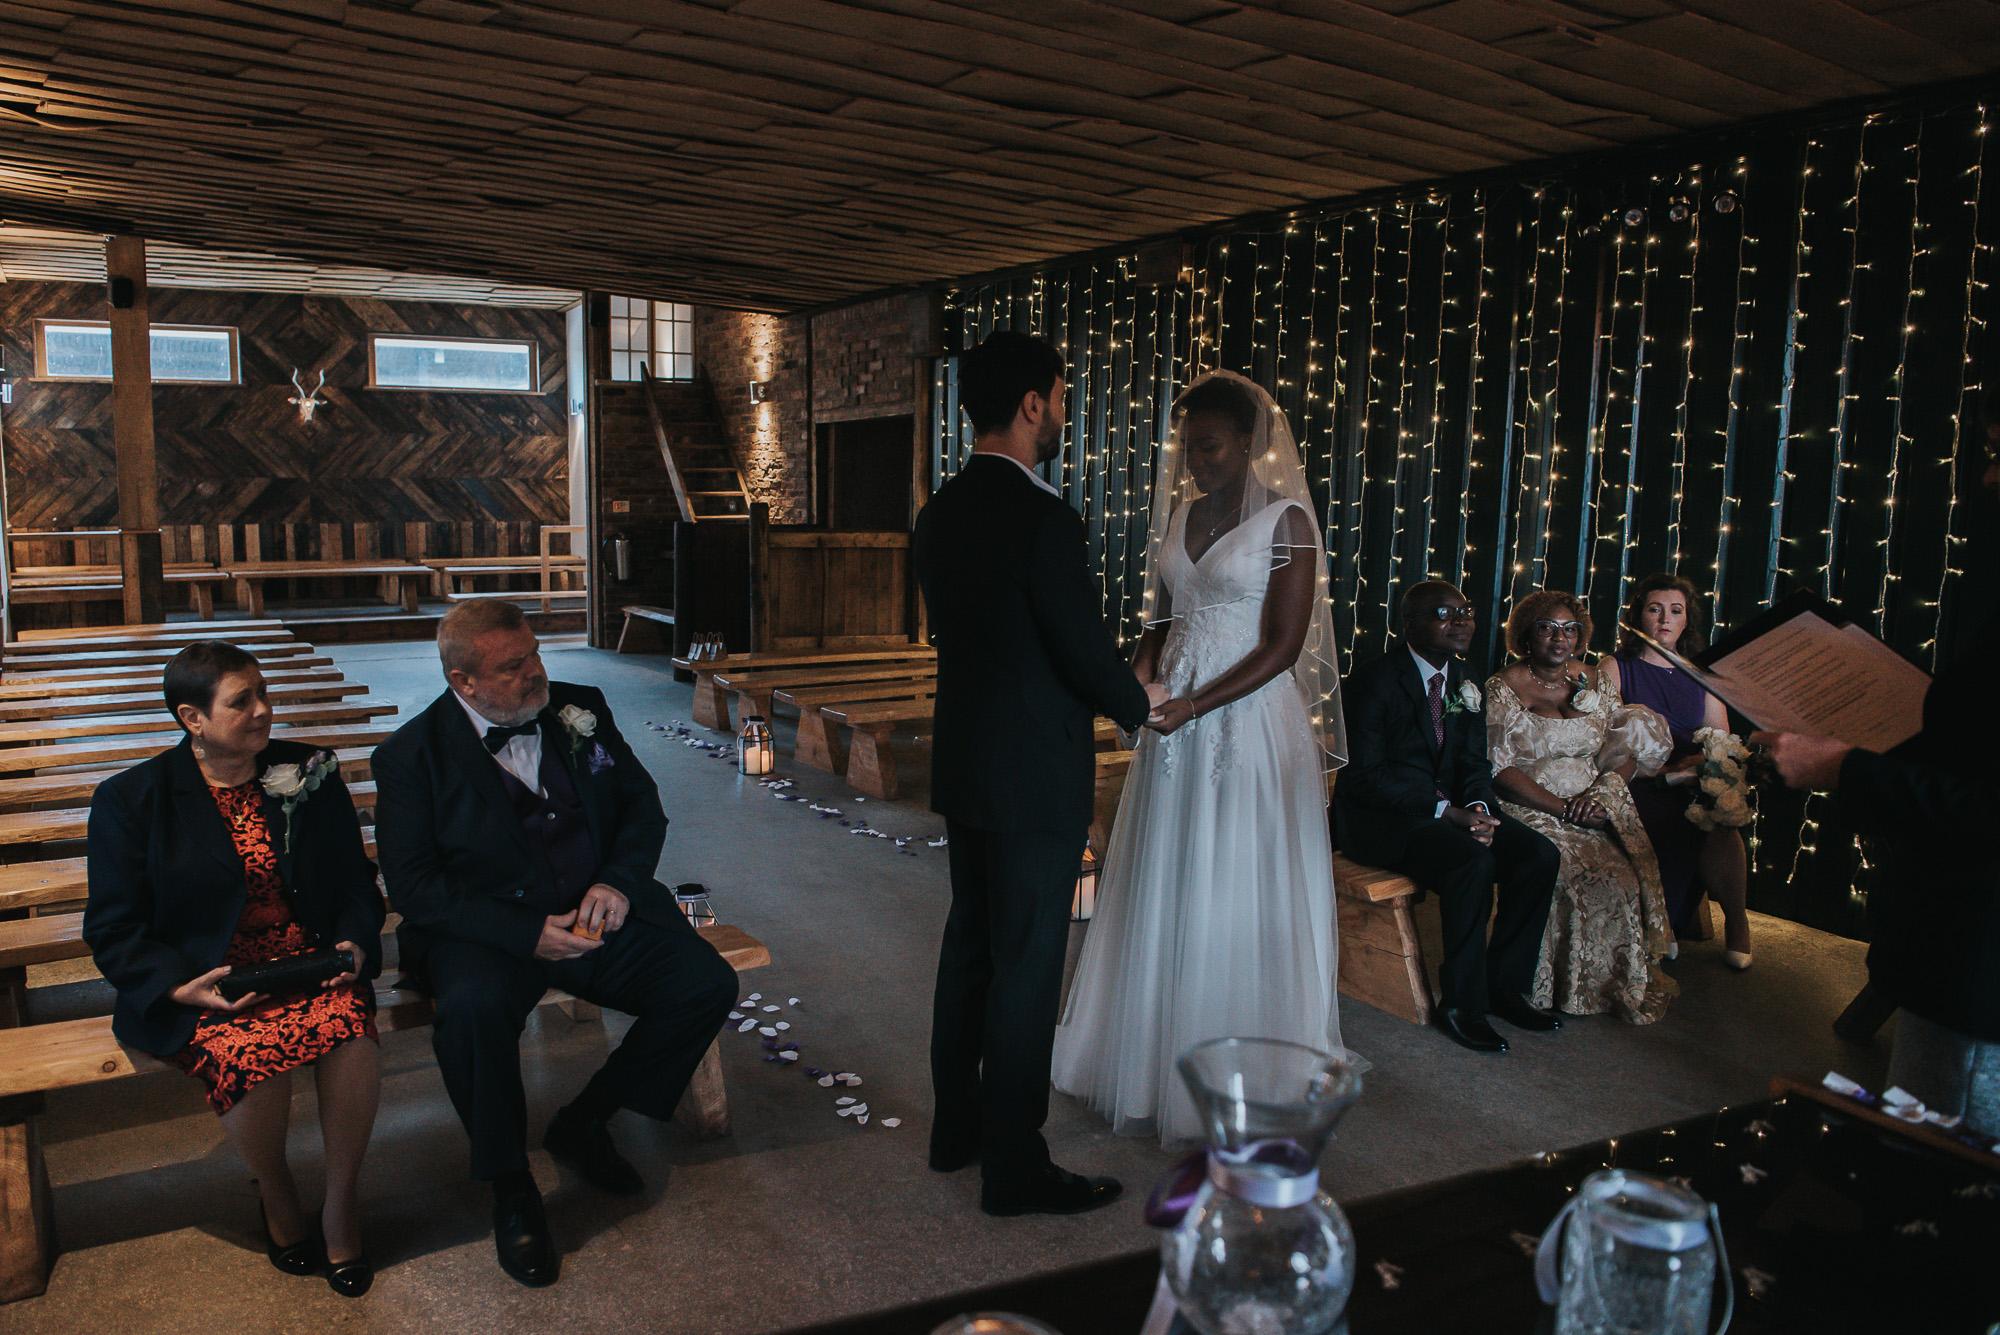 Owen HOuse Wedding Barn WEdding Photographer cheshire adam joe roberts photography (17 of 36).jpg